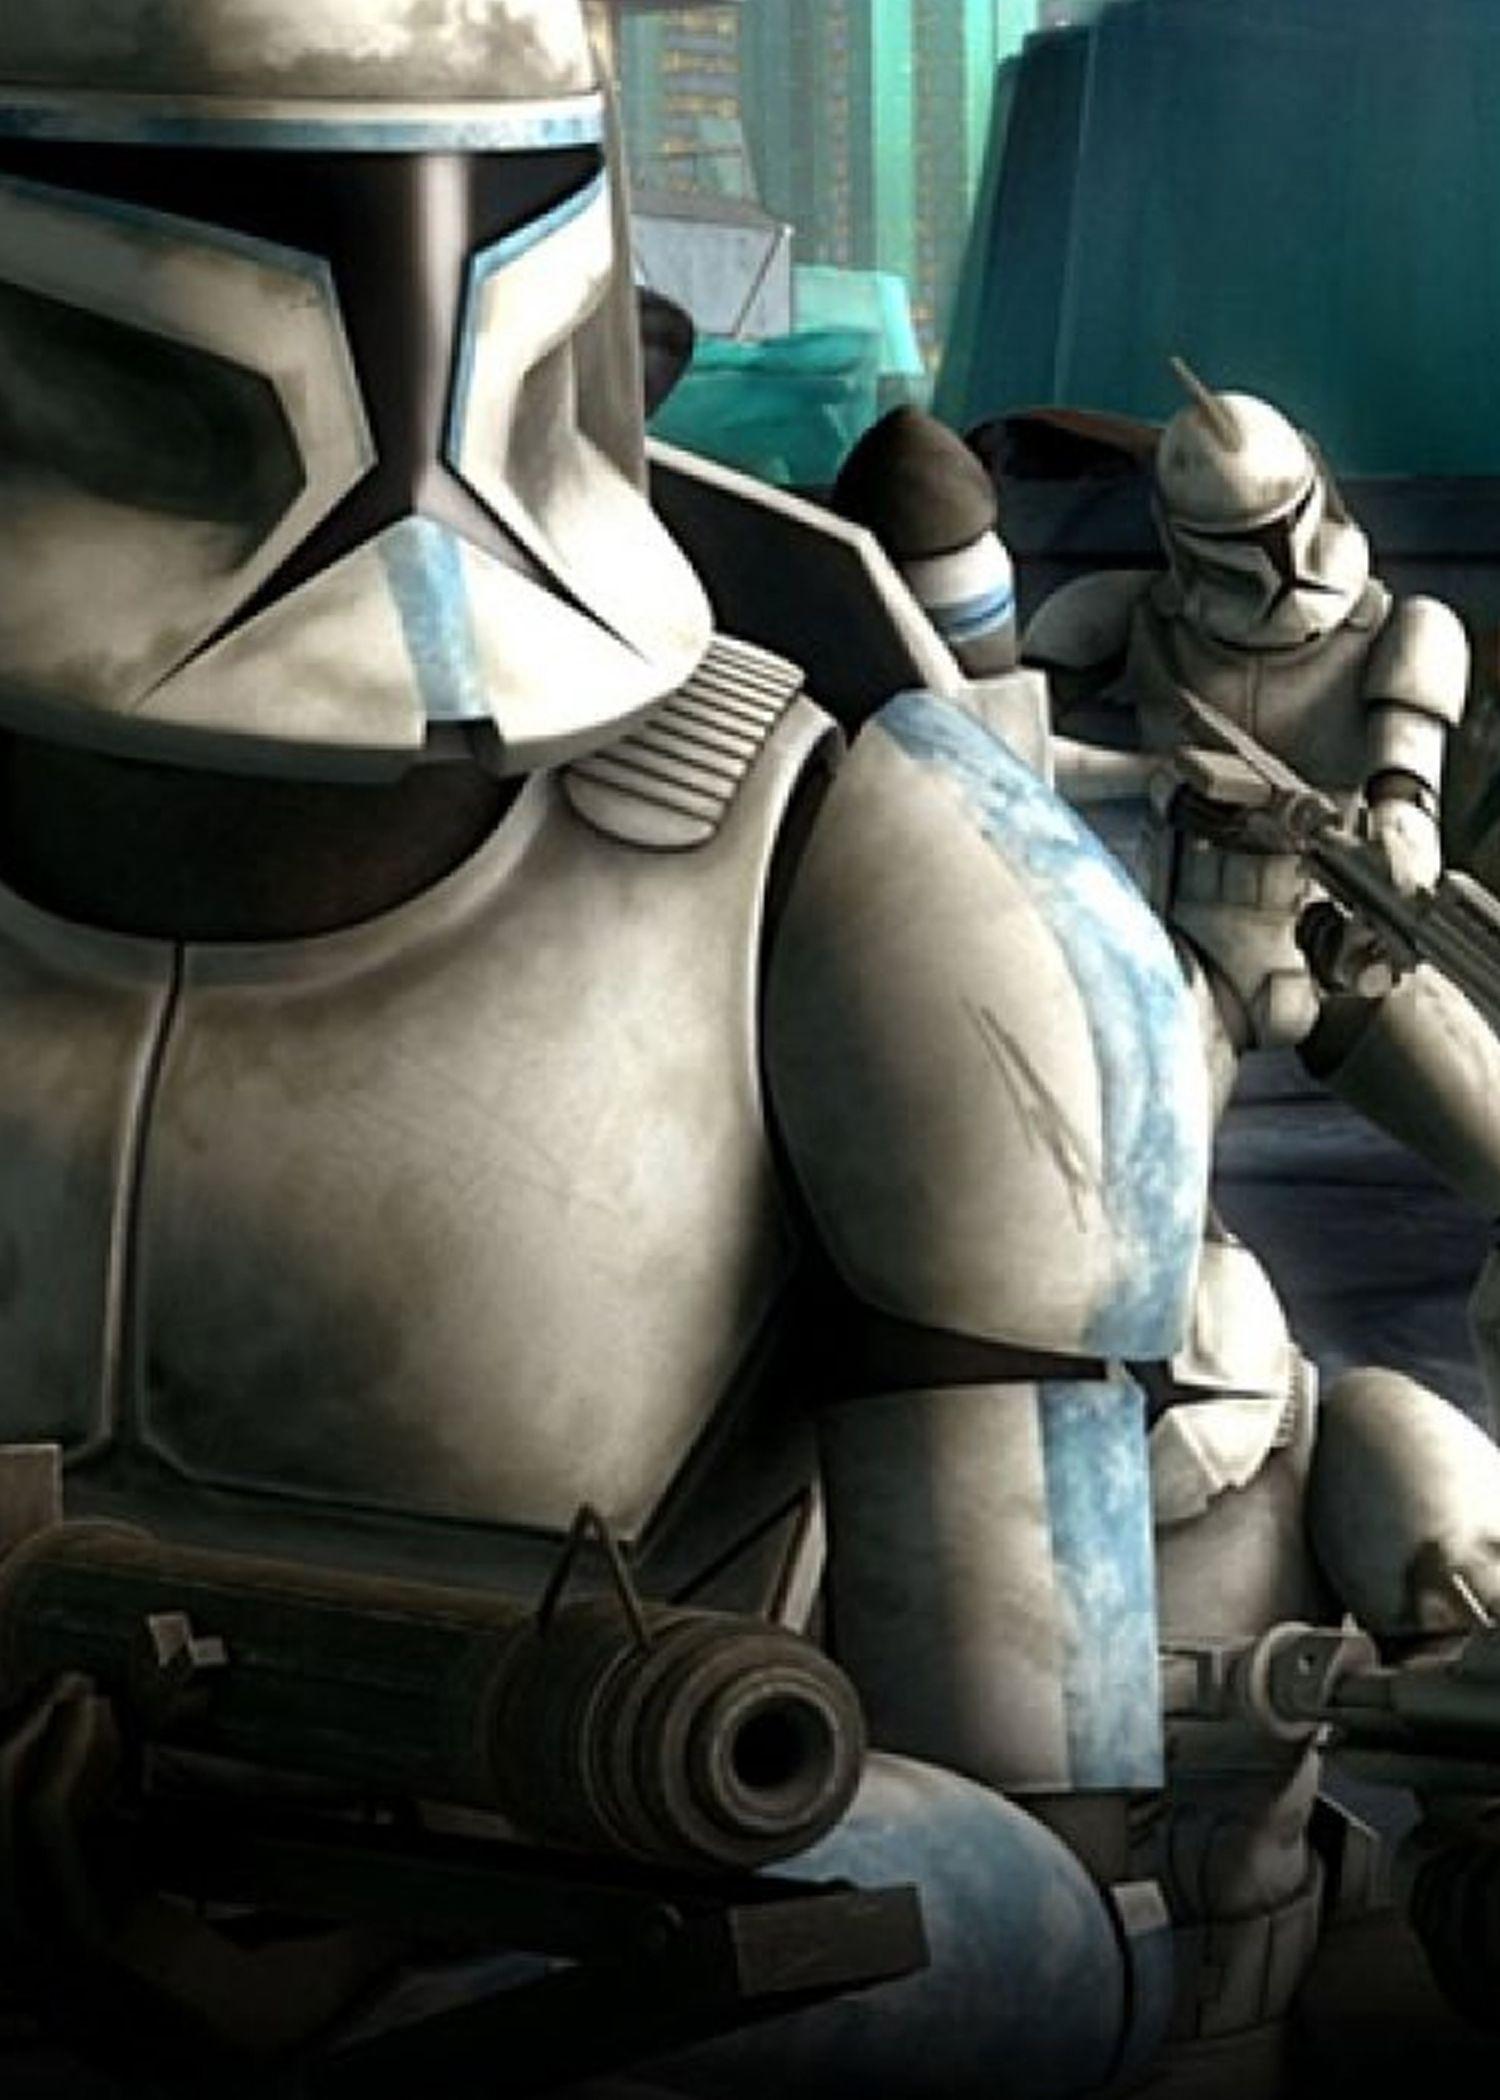 Star Wars Clone Trooper Wallpaper 1500x2100 Download Hd Wallpaper Wallpapertip